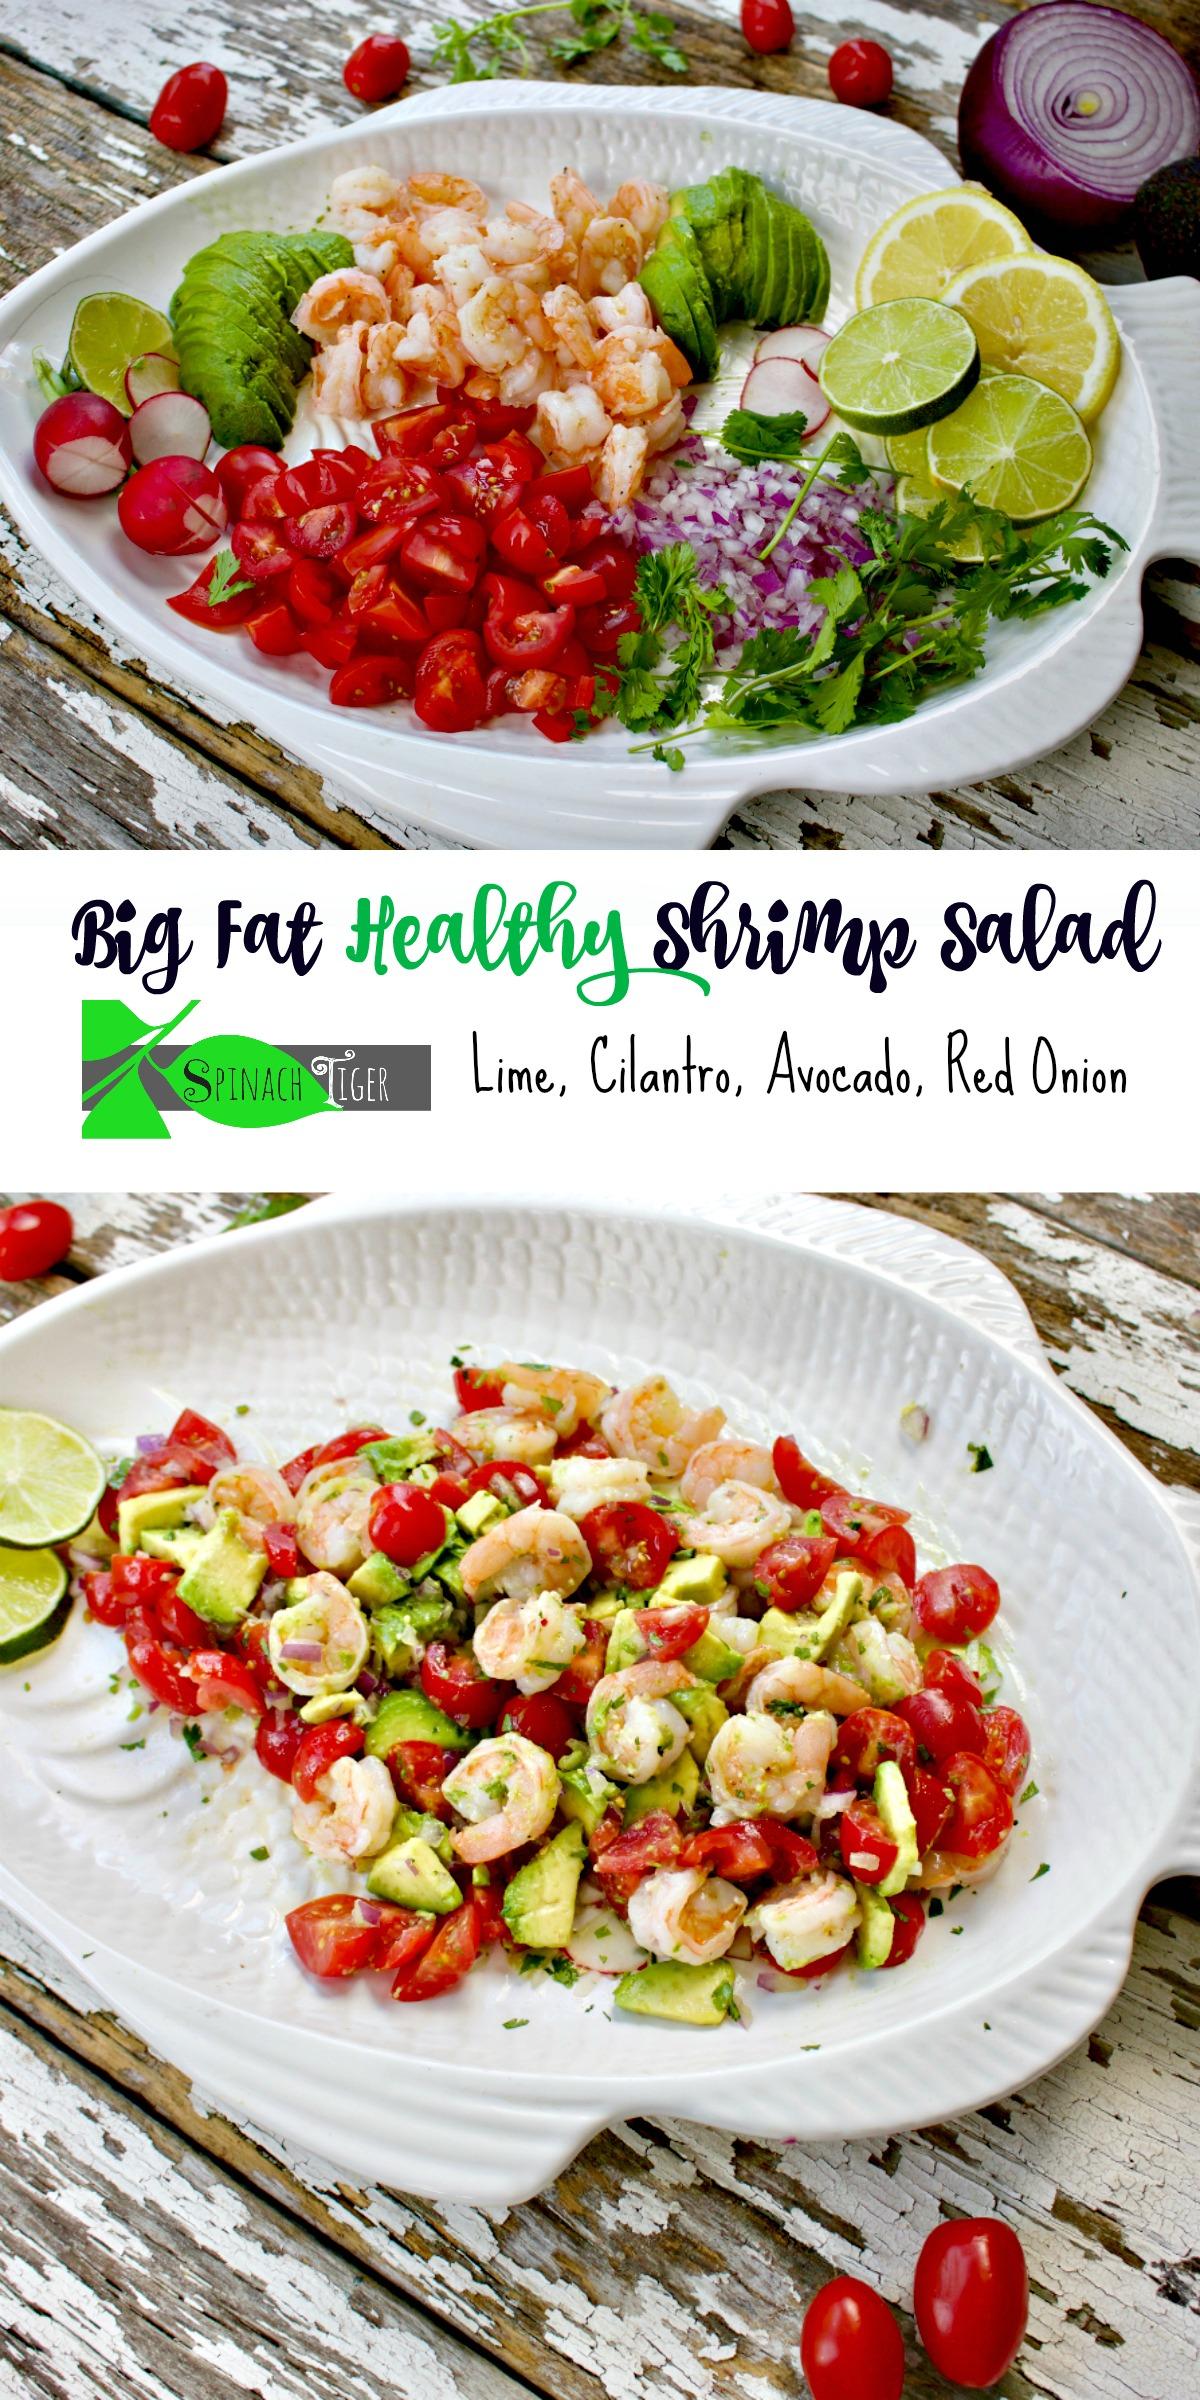 Best Shrimp Avocado Salad Recipe from Spinach Tiger